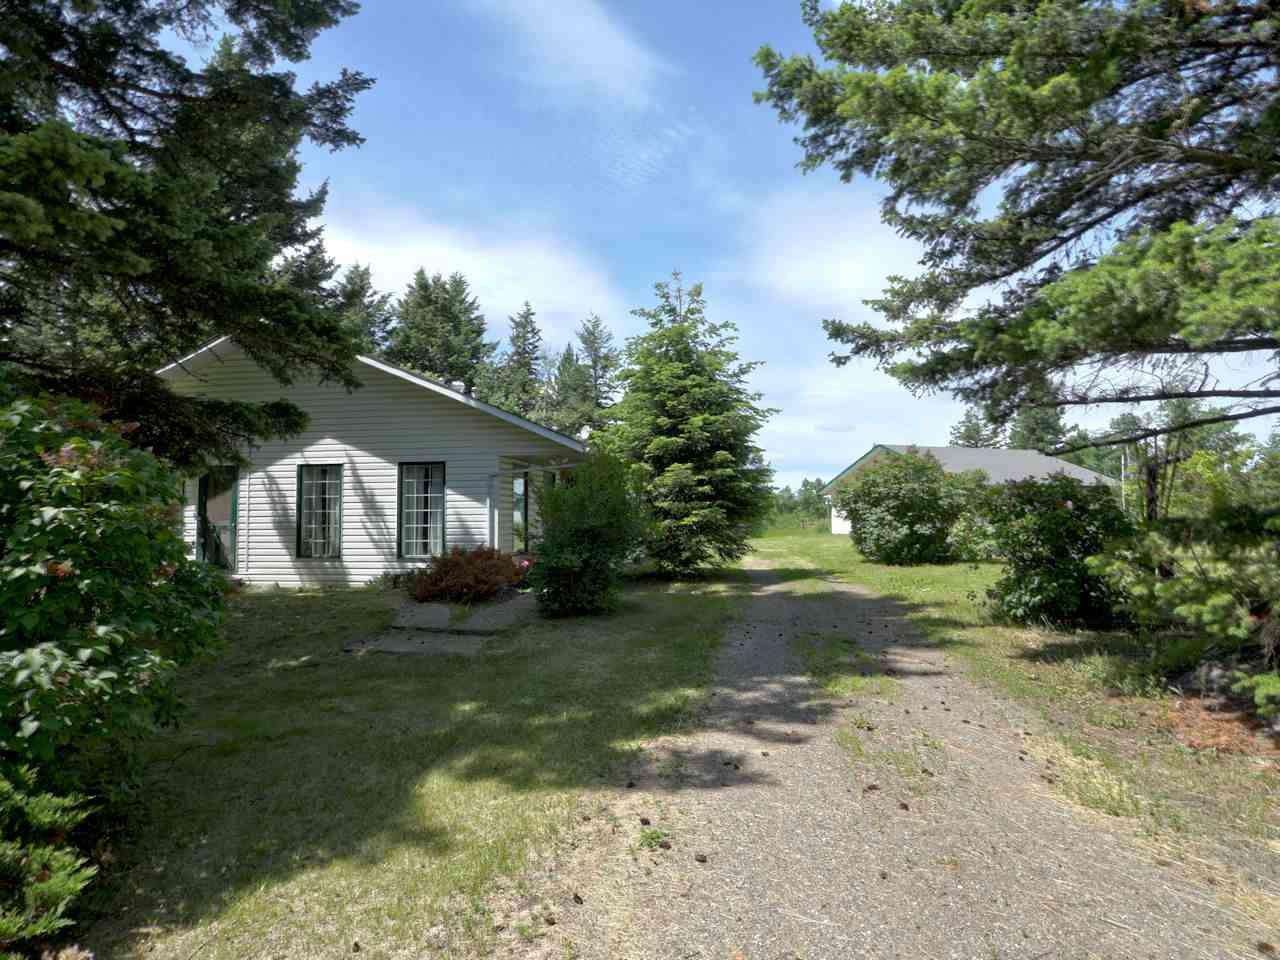 Main Photo: 4457 FIRCREST Road: Lac la Hache House for sale (100 Mile House (Zone 10))  : MLS®# R2468619